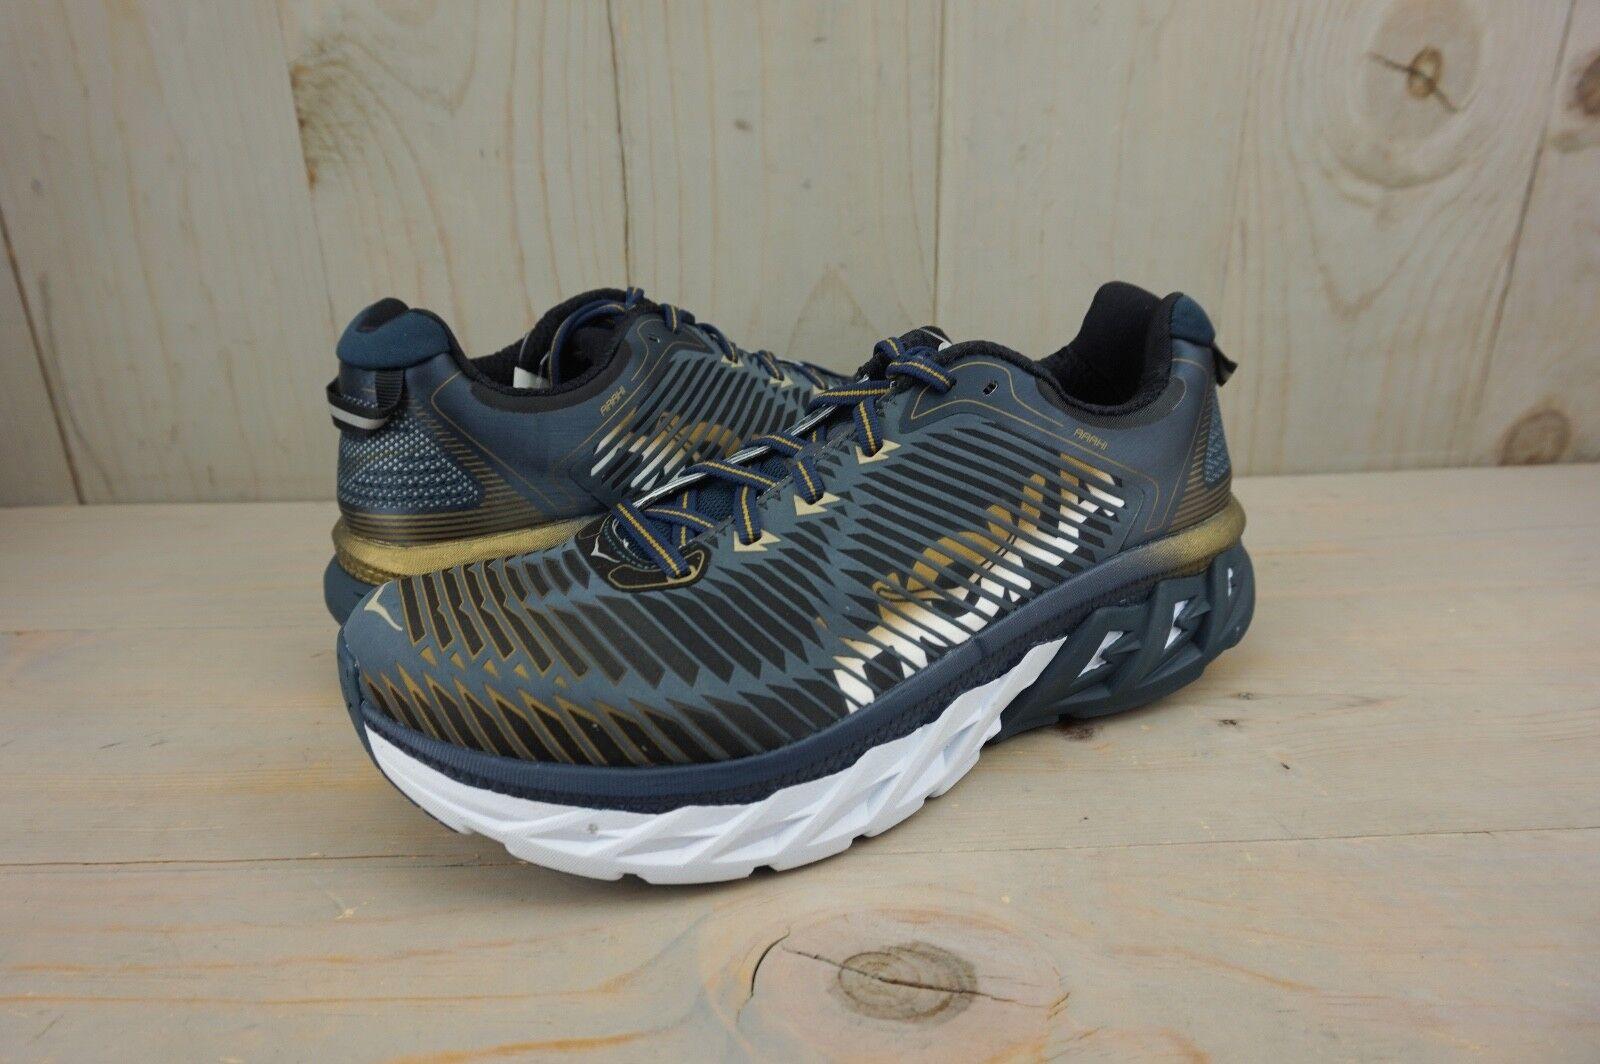 Hoka One One arahi azul marino noche dorado metálico ejecuta Zapatos para Hombre US 9 Nuevo